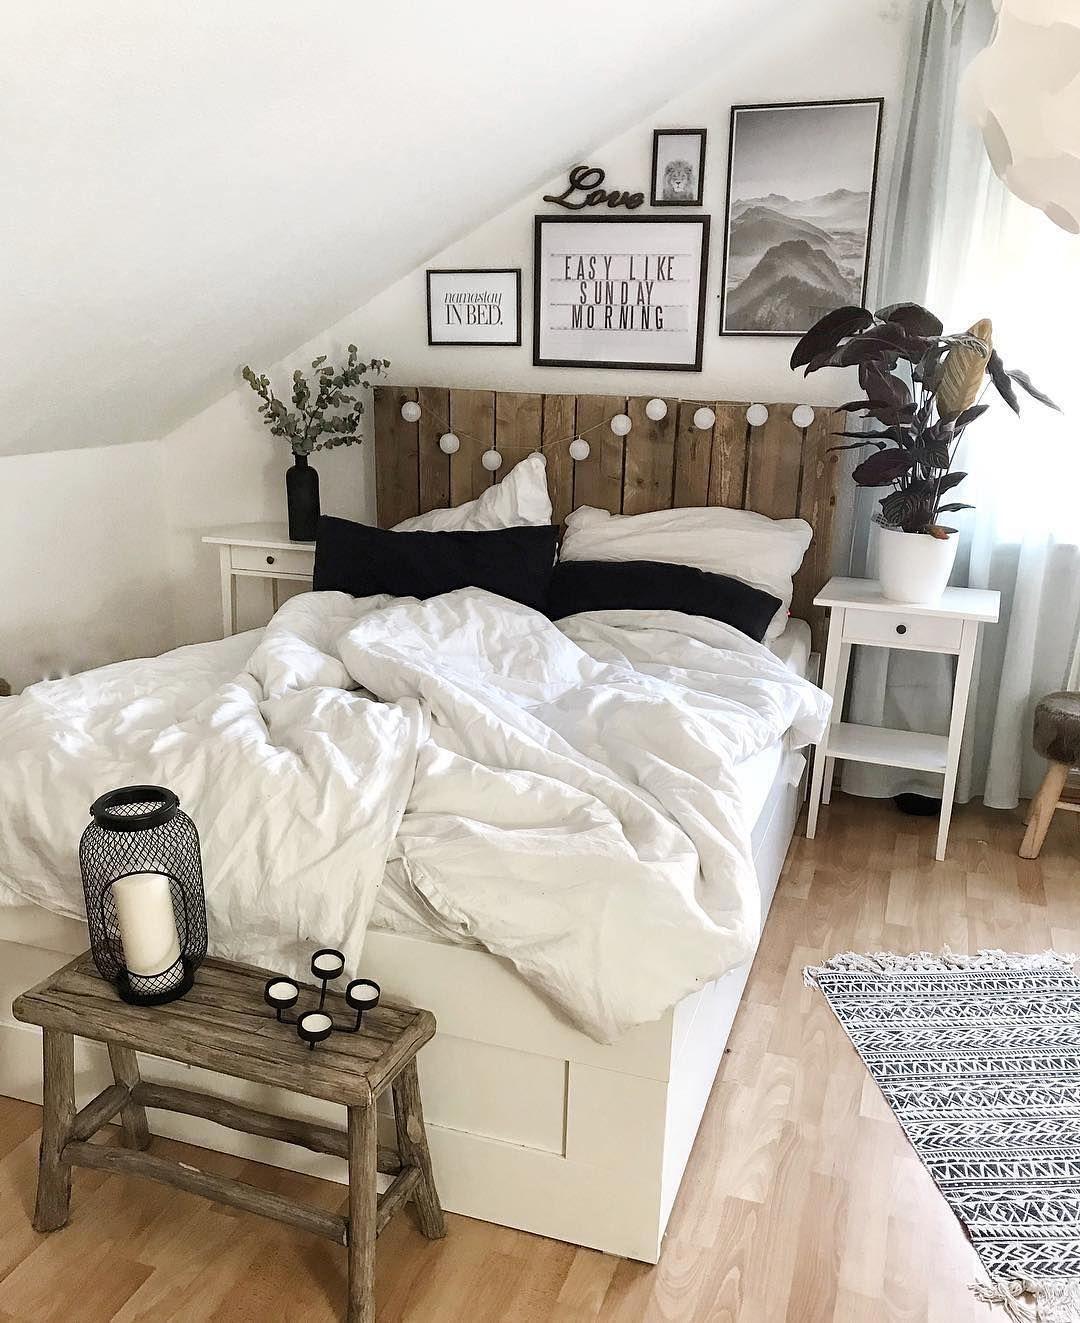 Simple Pretty Bedroom | Chambre deco ado, Idée chambre et ...